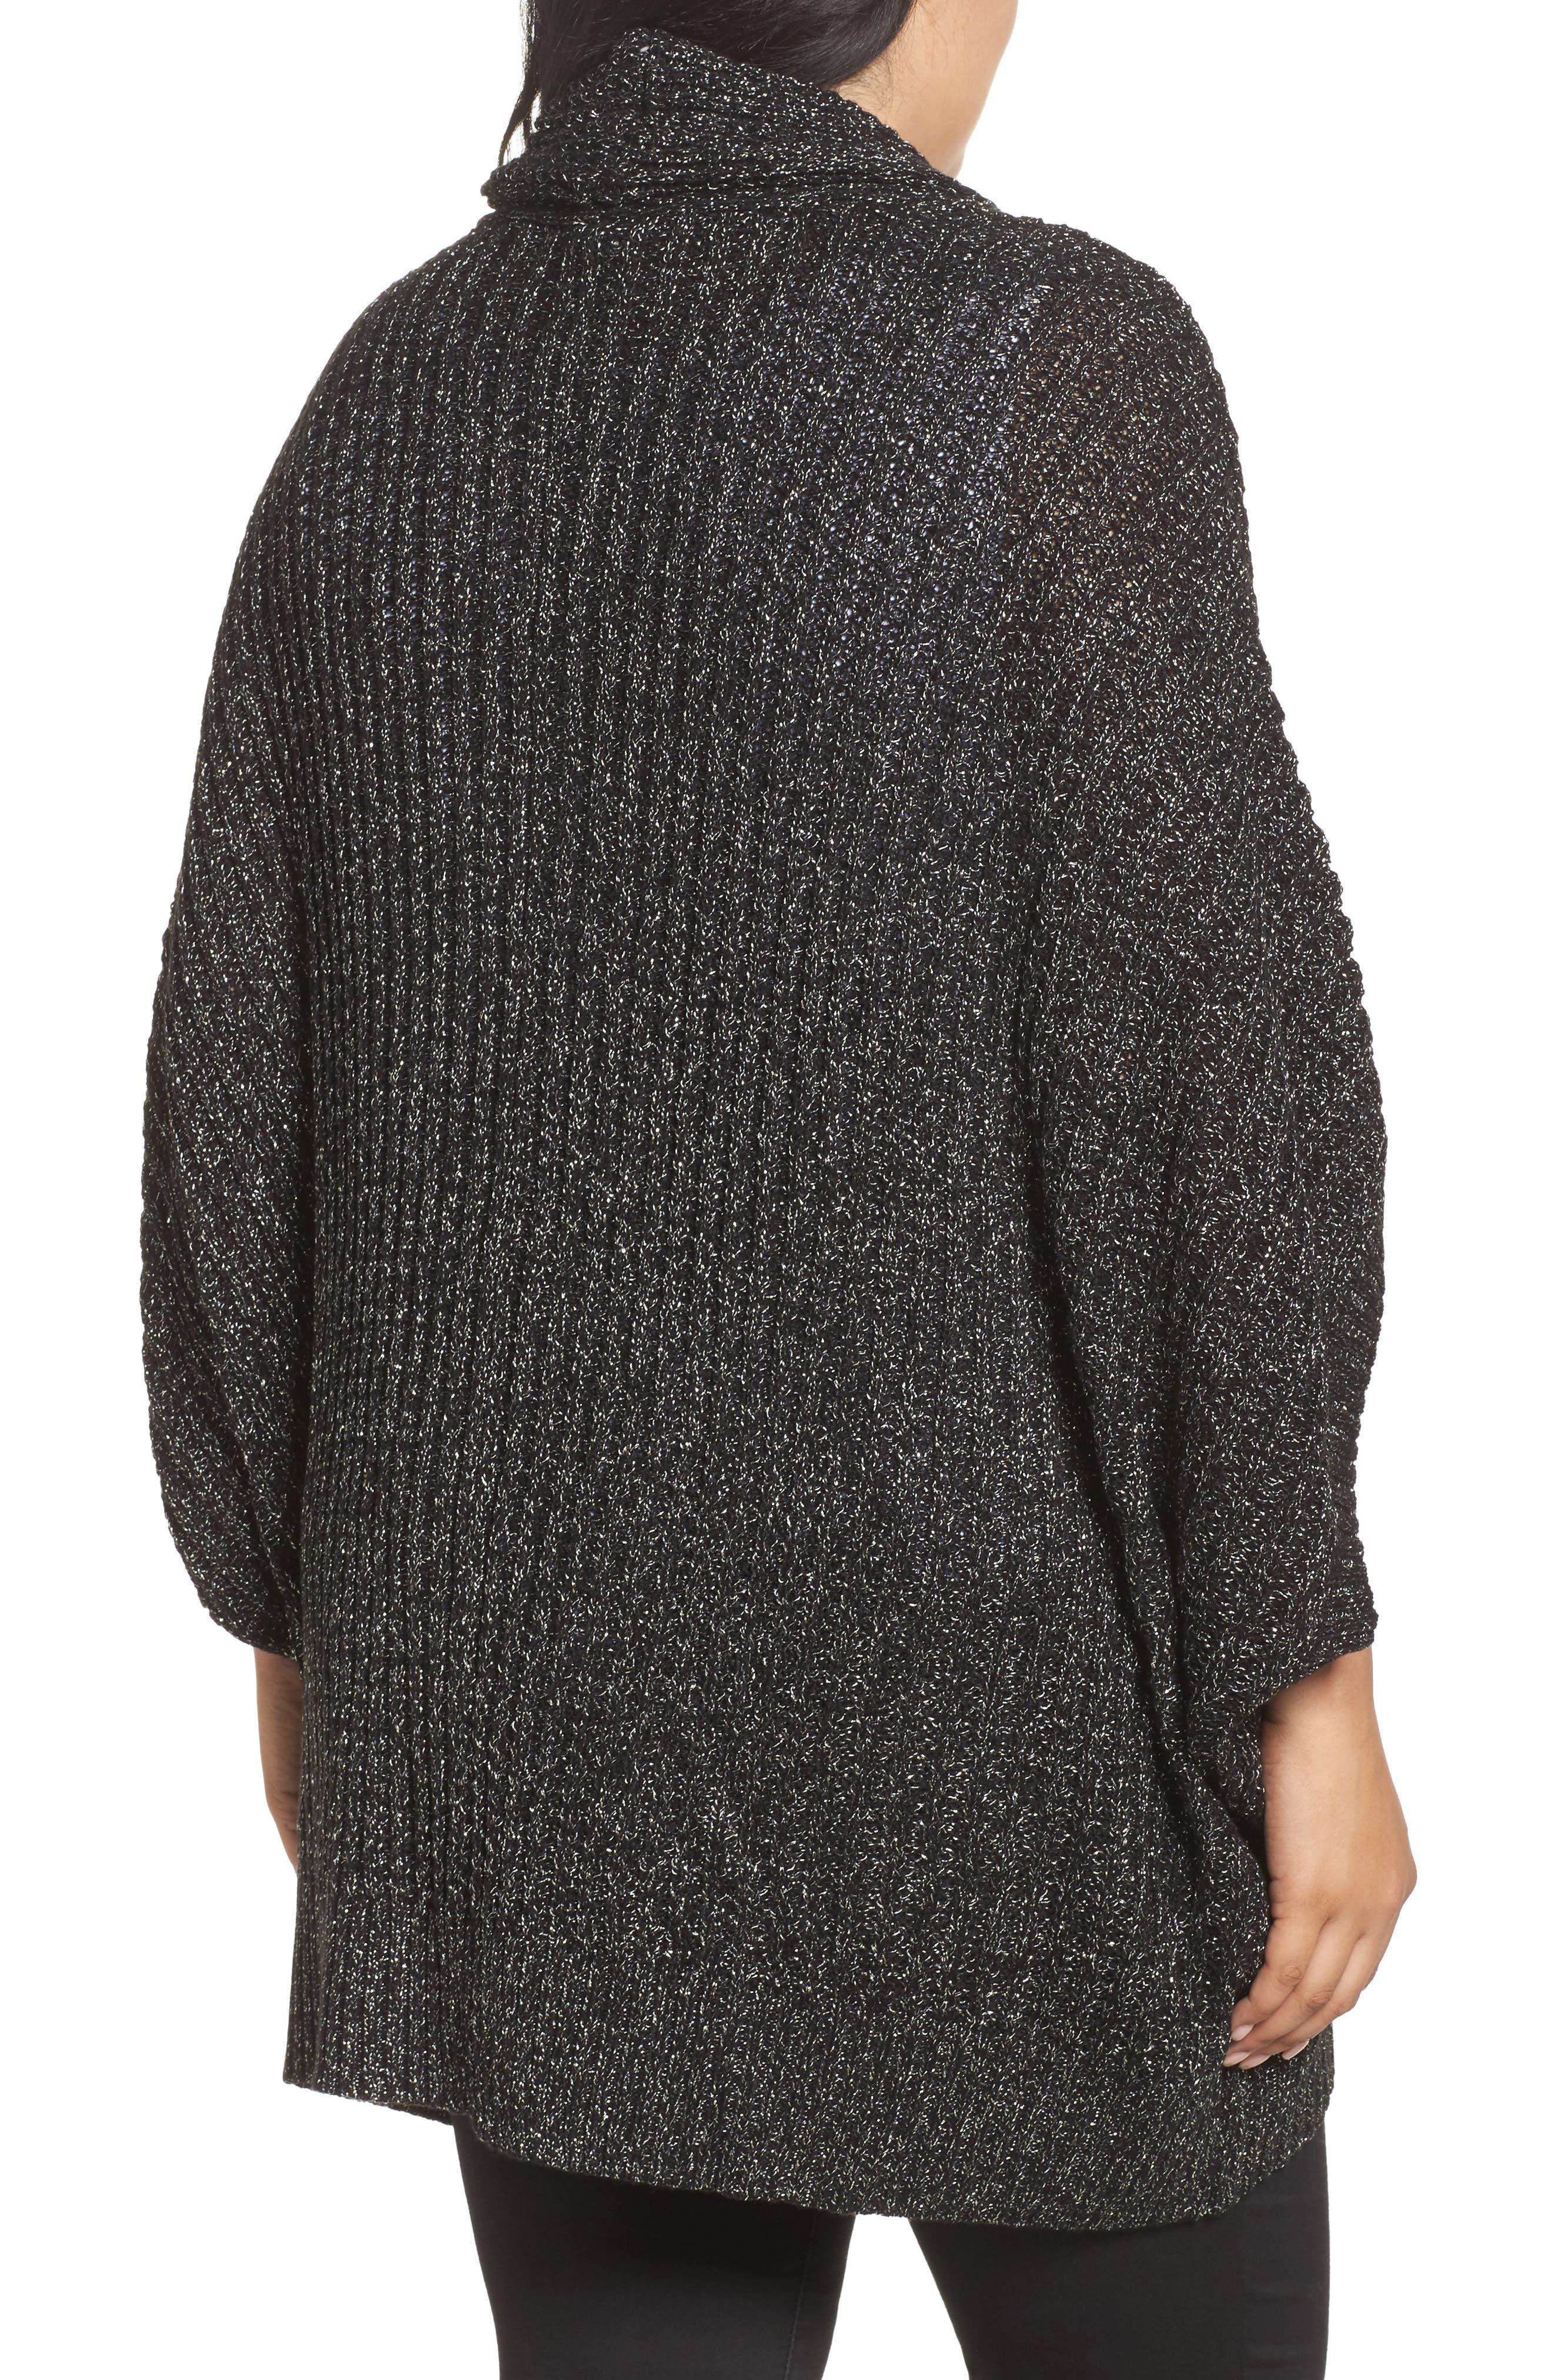 Alternate Image 2  - Melissa McCarthy Seven7 Cocoon Cardigan (Plus Size)